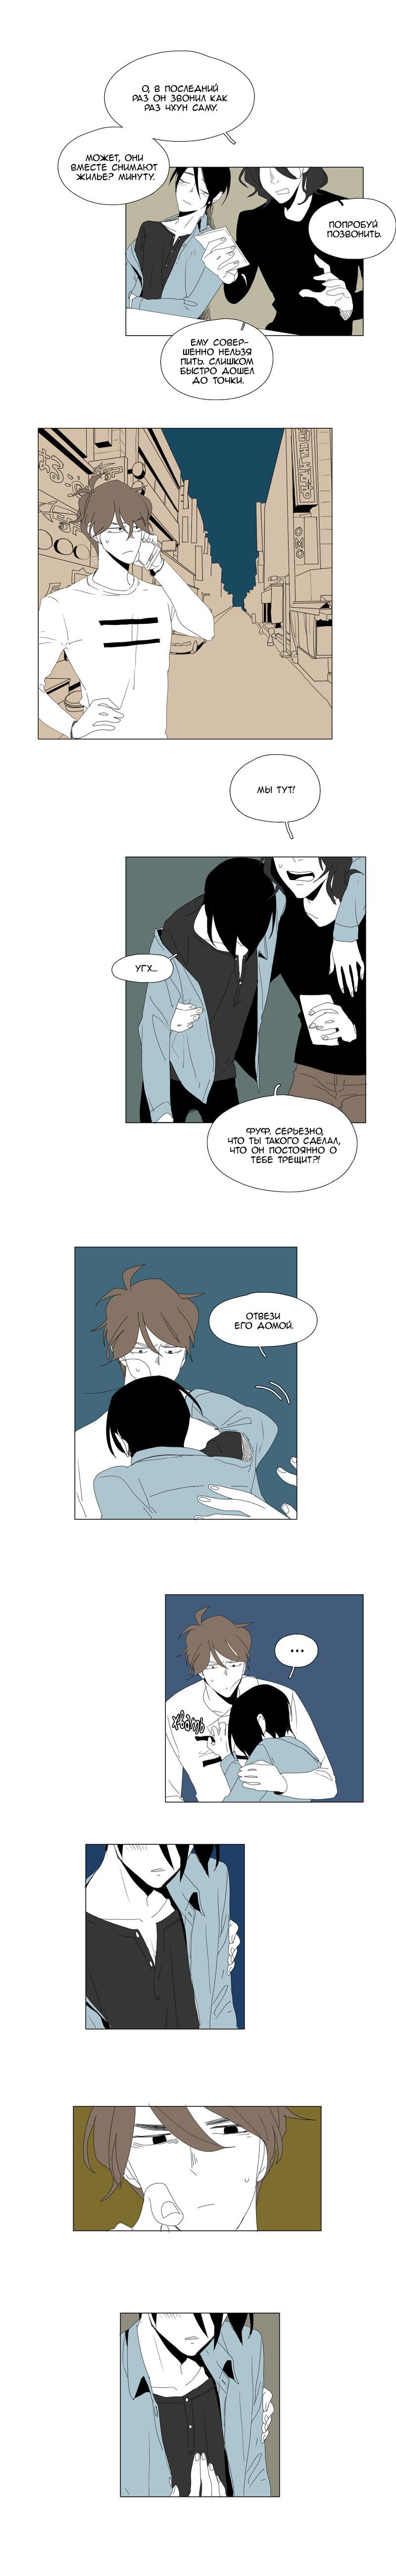 https://r1.ninemanga.com/comics/pic2/33/27873/333362/1504714627965.jpg Page 7